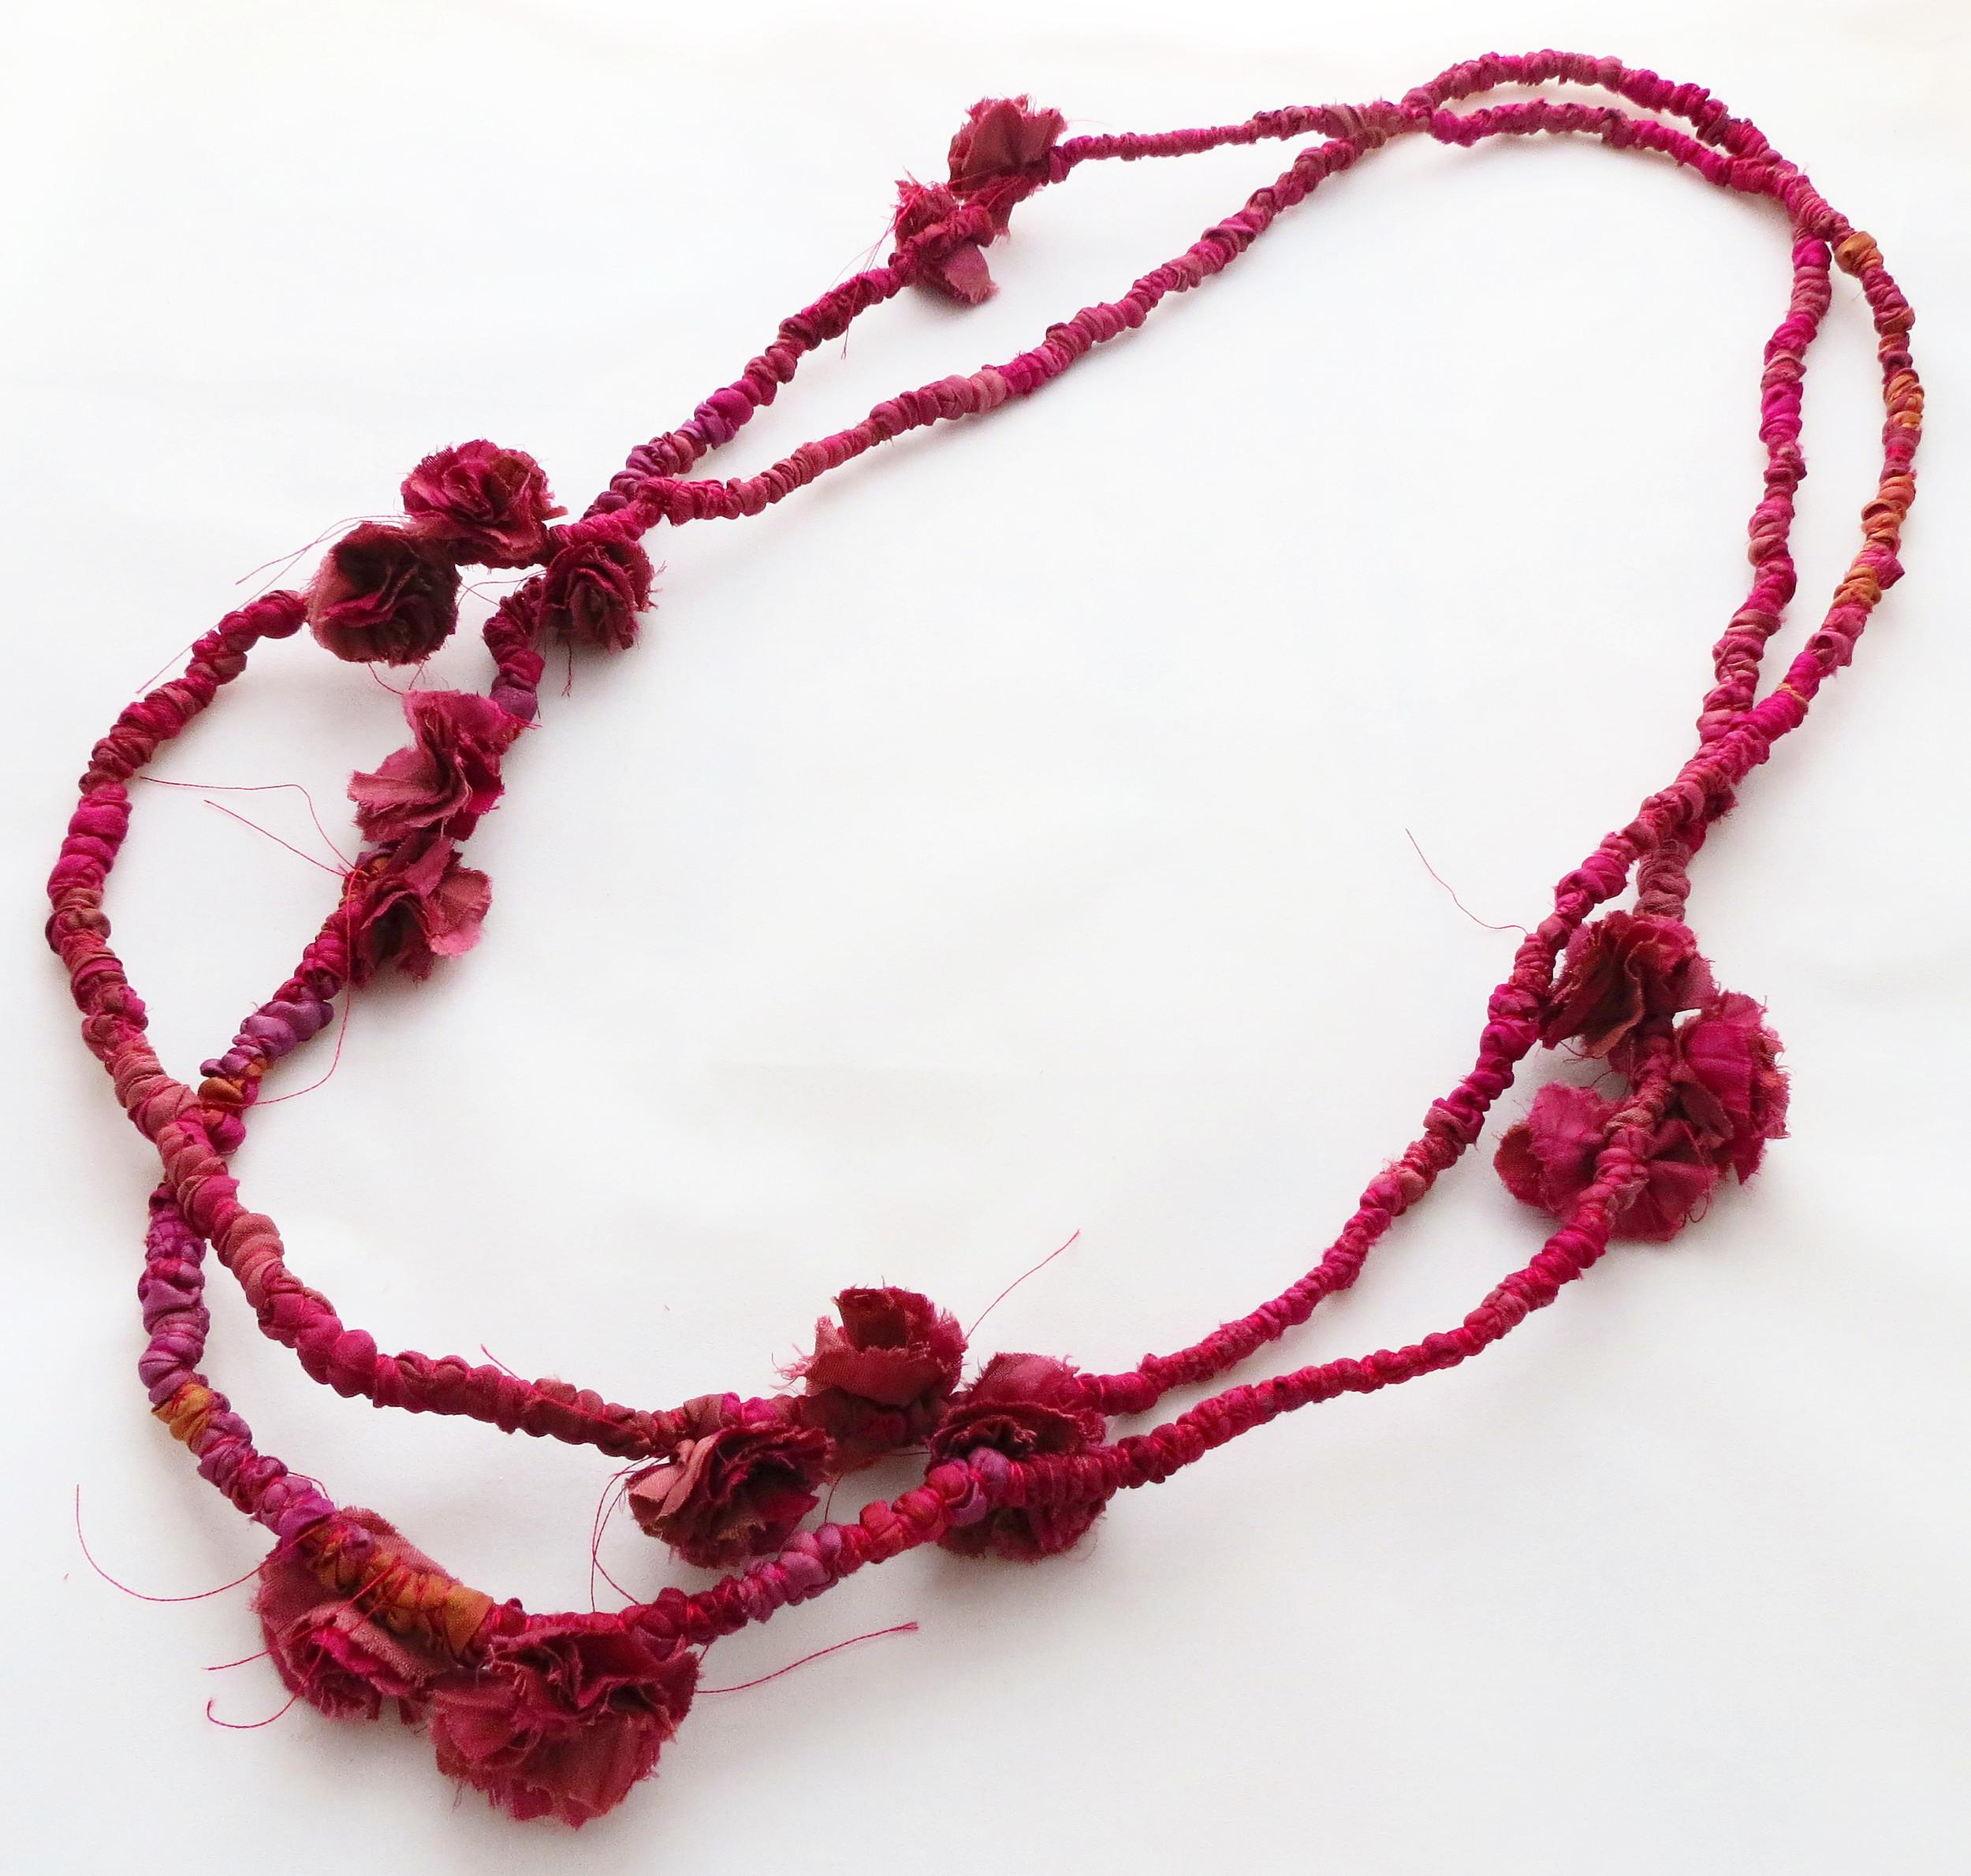 Maala – Francesca Cecchini (2014), necklace // Materials: repurposed sari silk, silk thread.